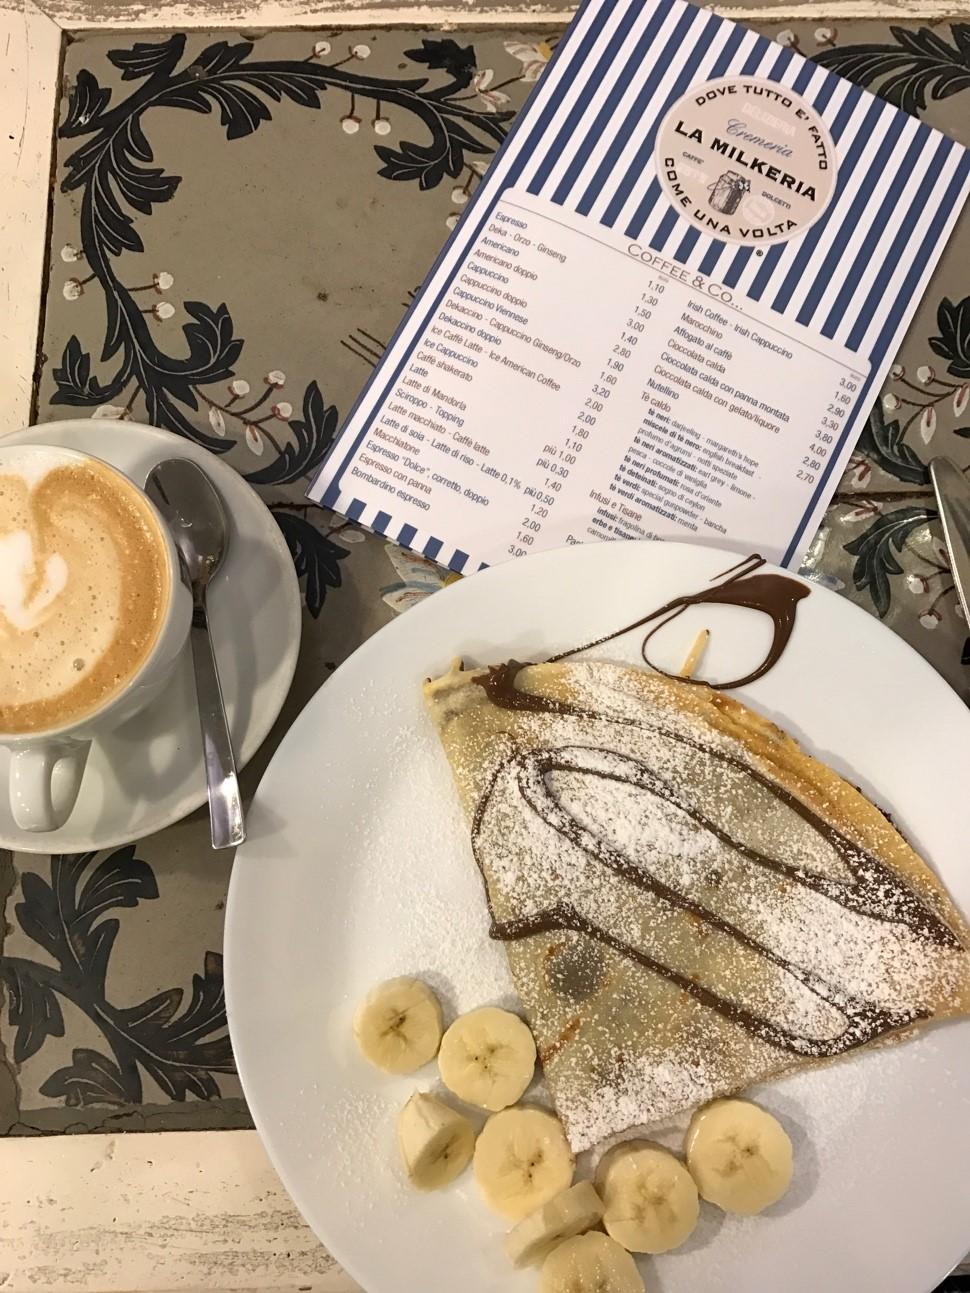 CAPAStudyAbroad_Florence_Spring2017_From Danya Carithers - Foodie post - Breakfast.jpg